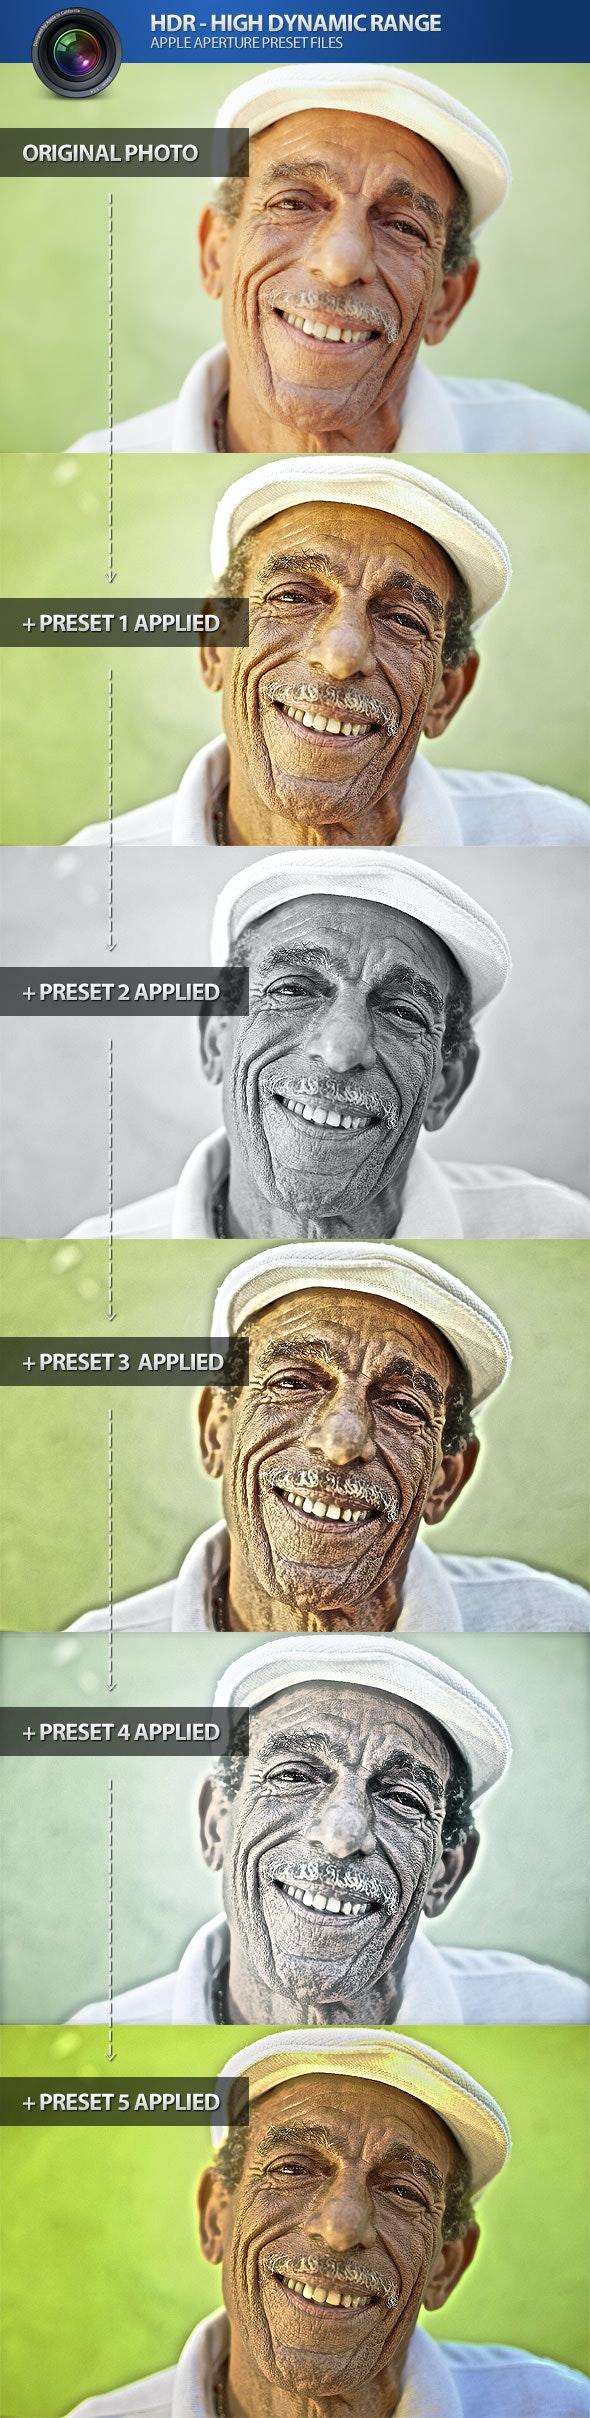 HDR High Dynamic Range Aperture Photo Presets - Aperture Presets Add-ons